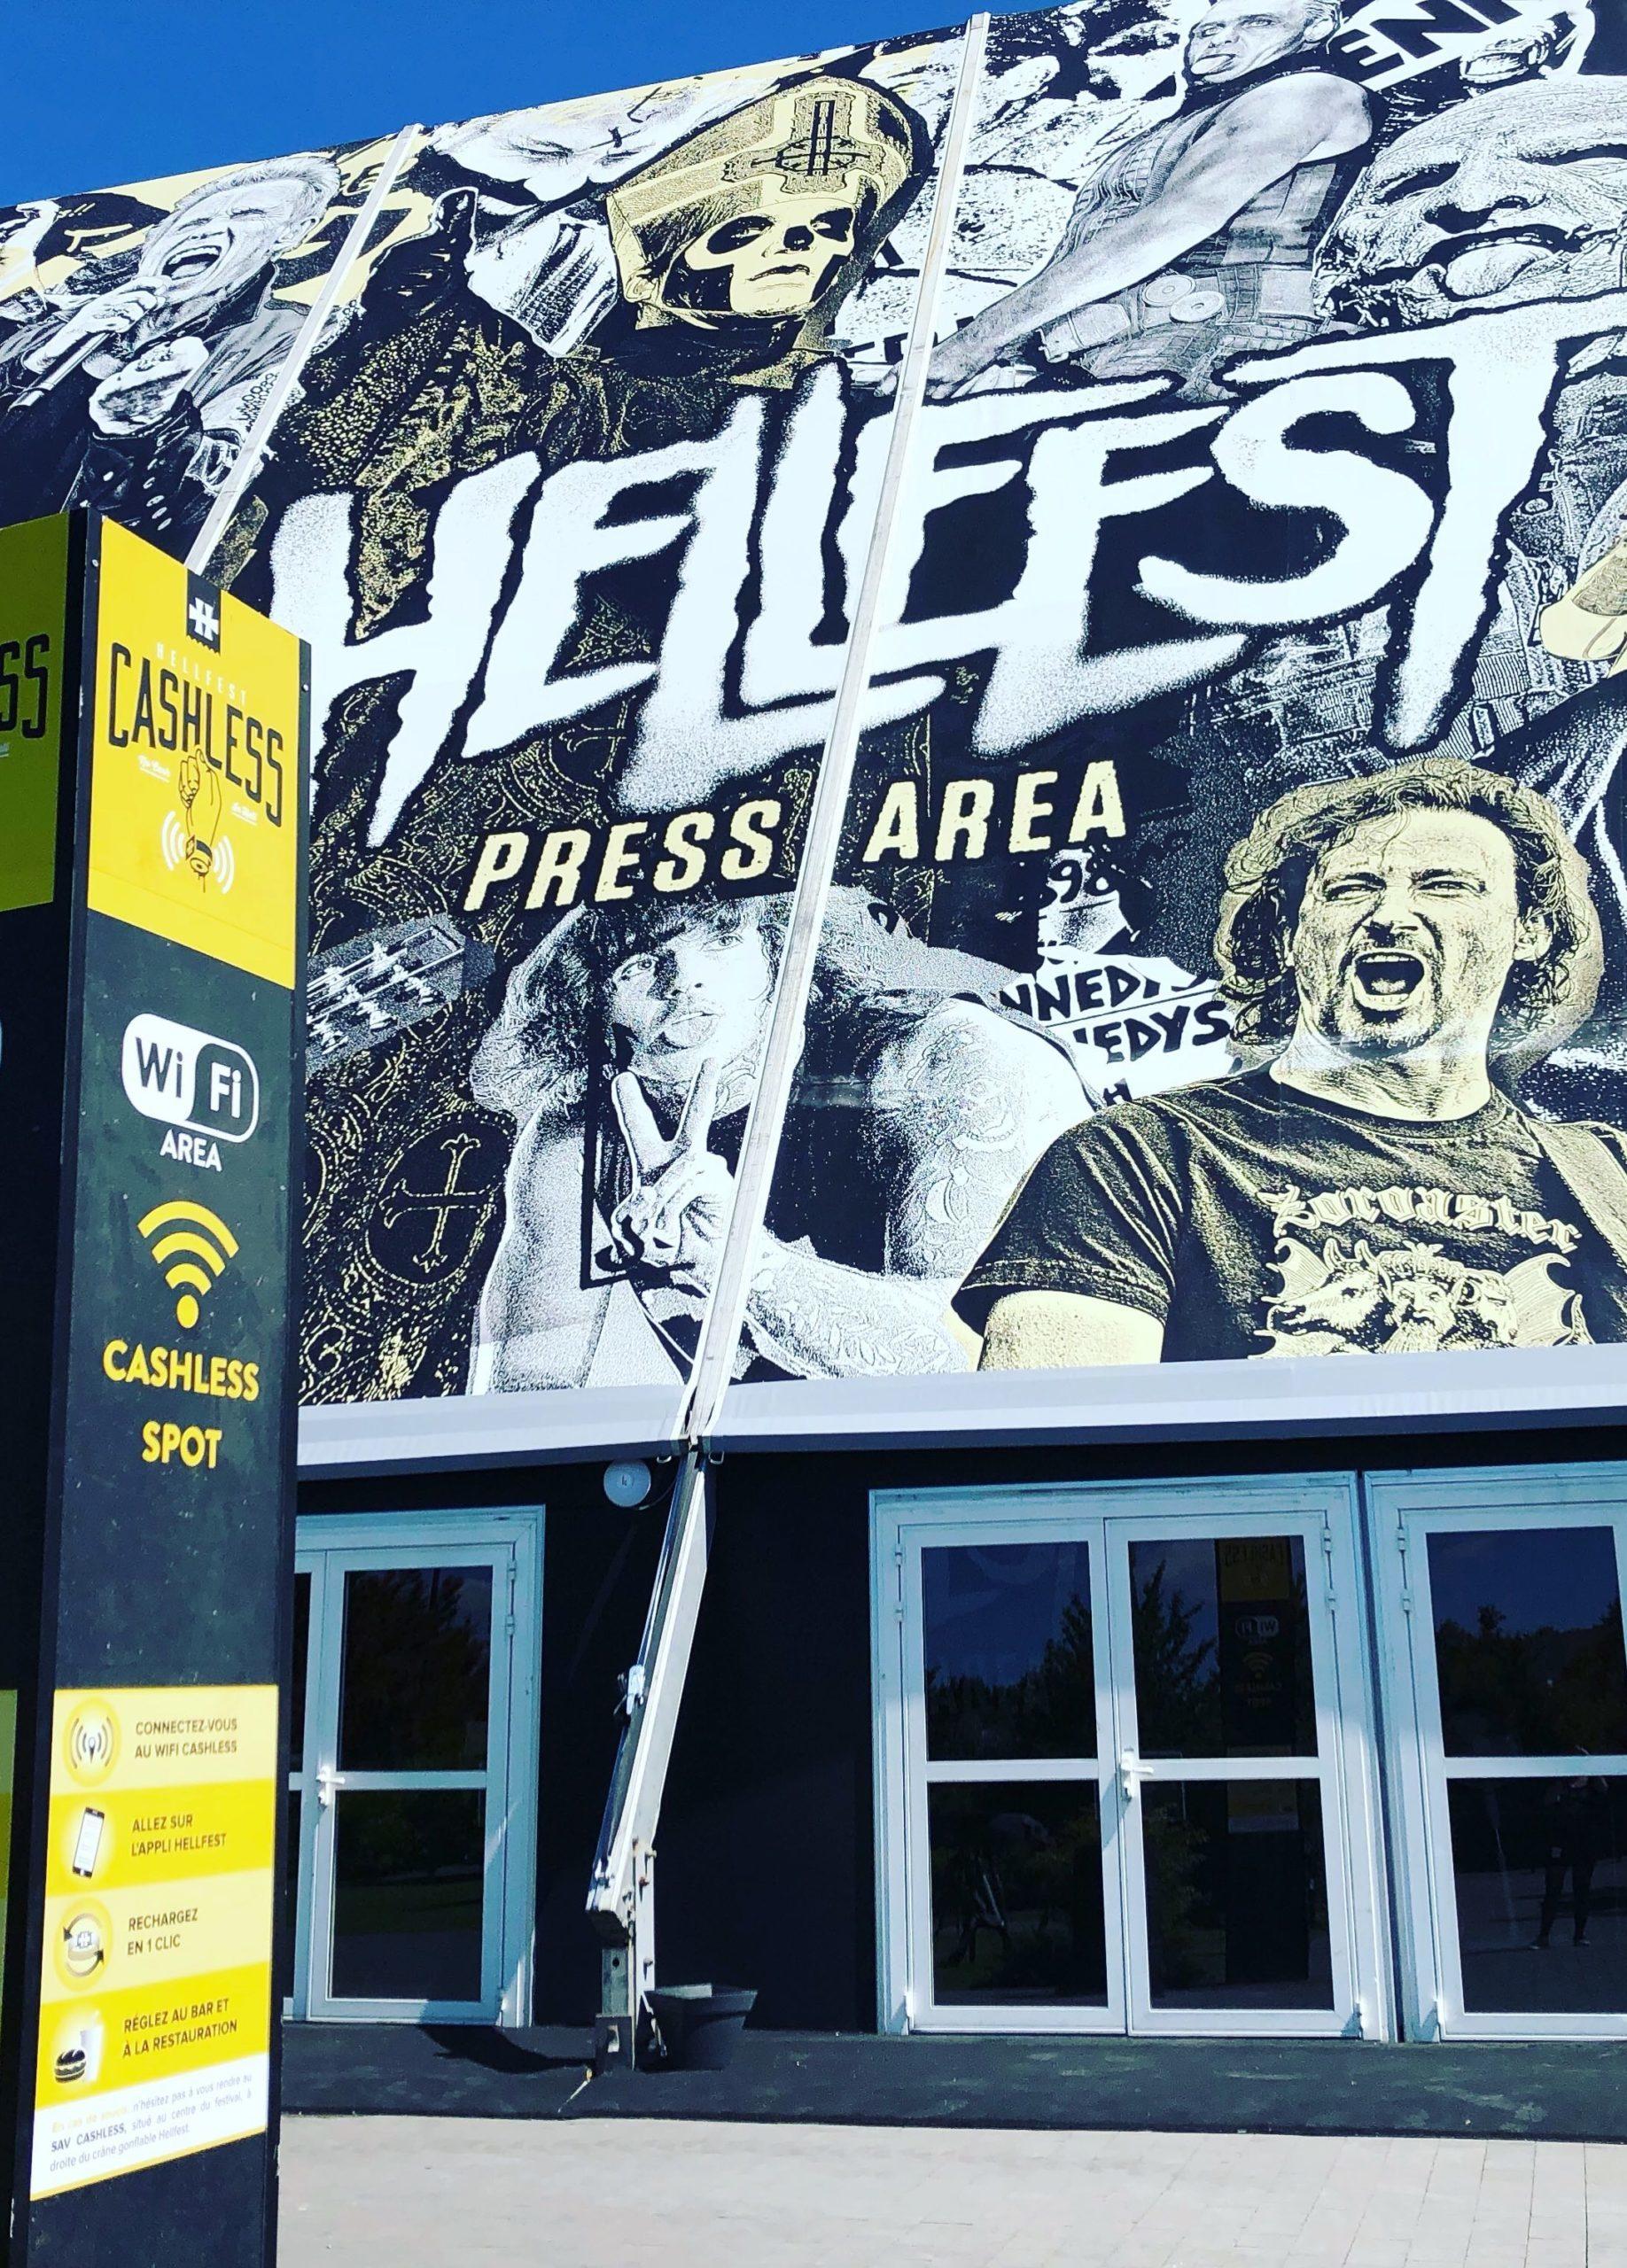 Hellfest – Replica Promo